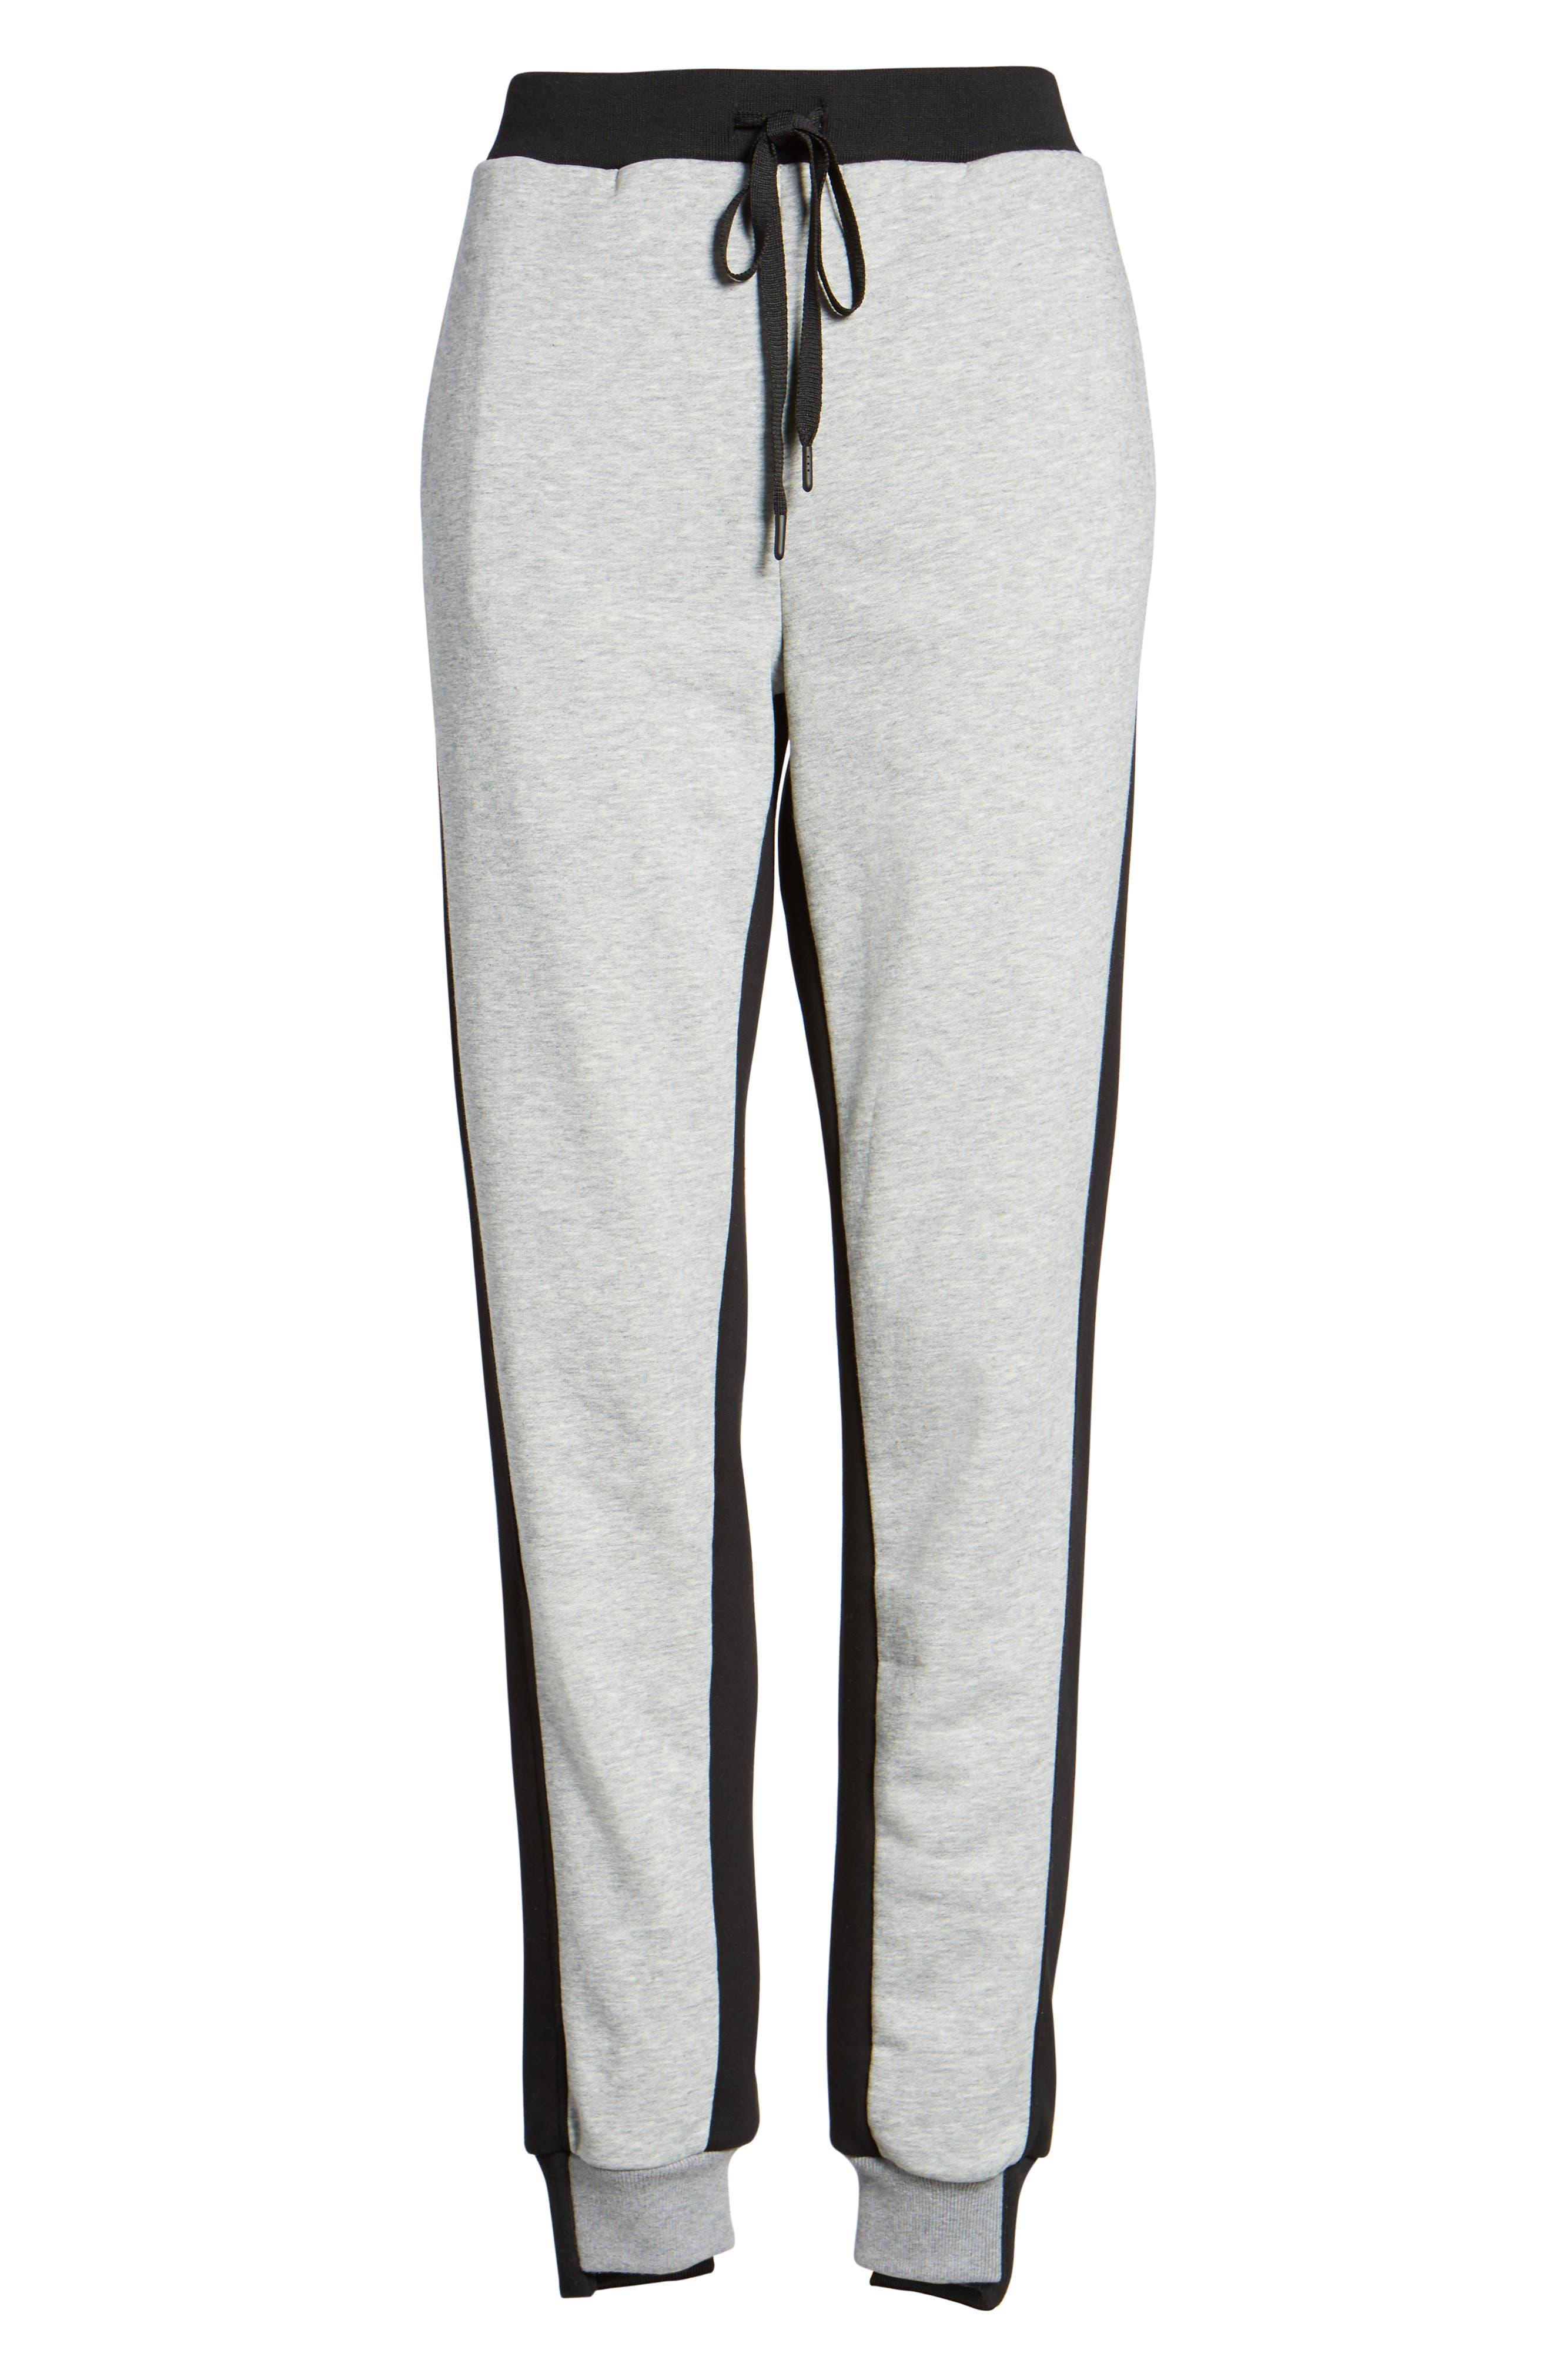 Paneled Sweatpants,                             Alternate thumbnail 6, color,                             Black/ Med. Heather Grey